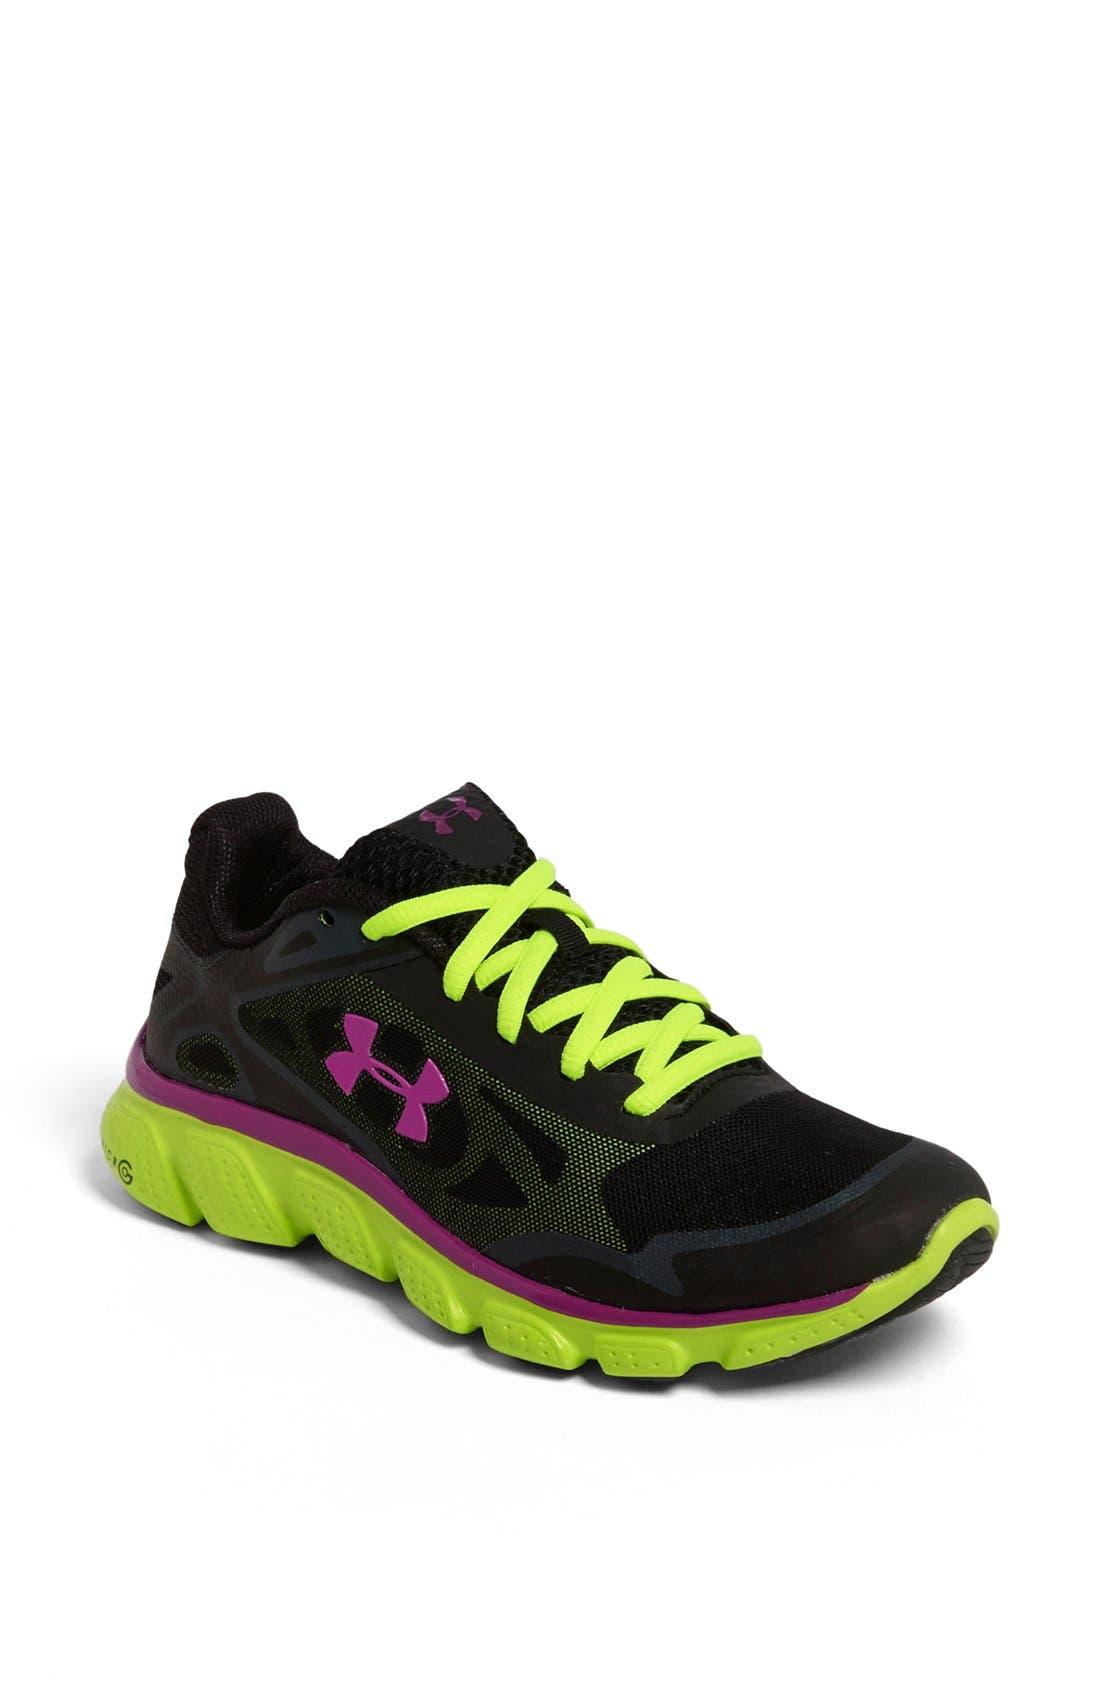 Main Image - Under Armour 'Micro G® Pulse' Running Shoe (Women)